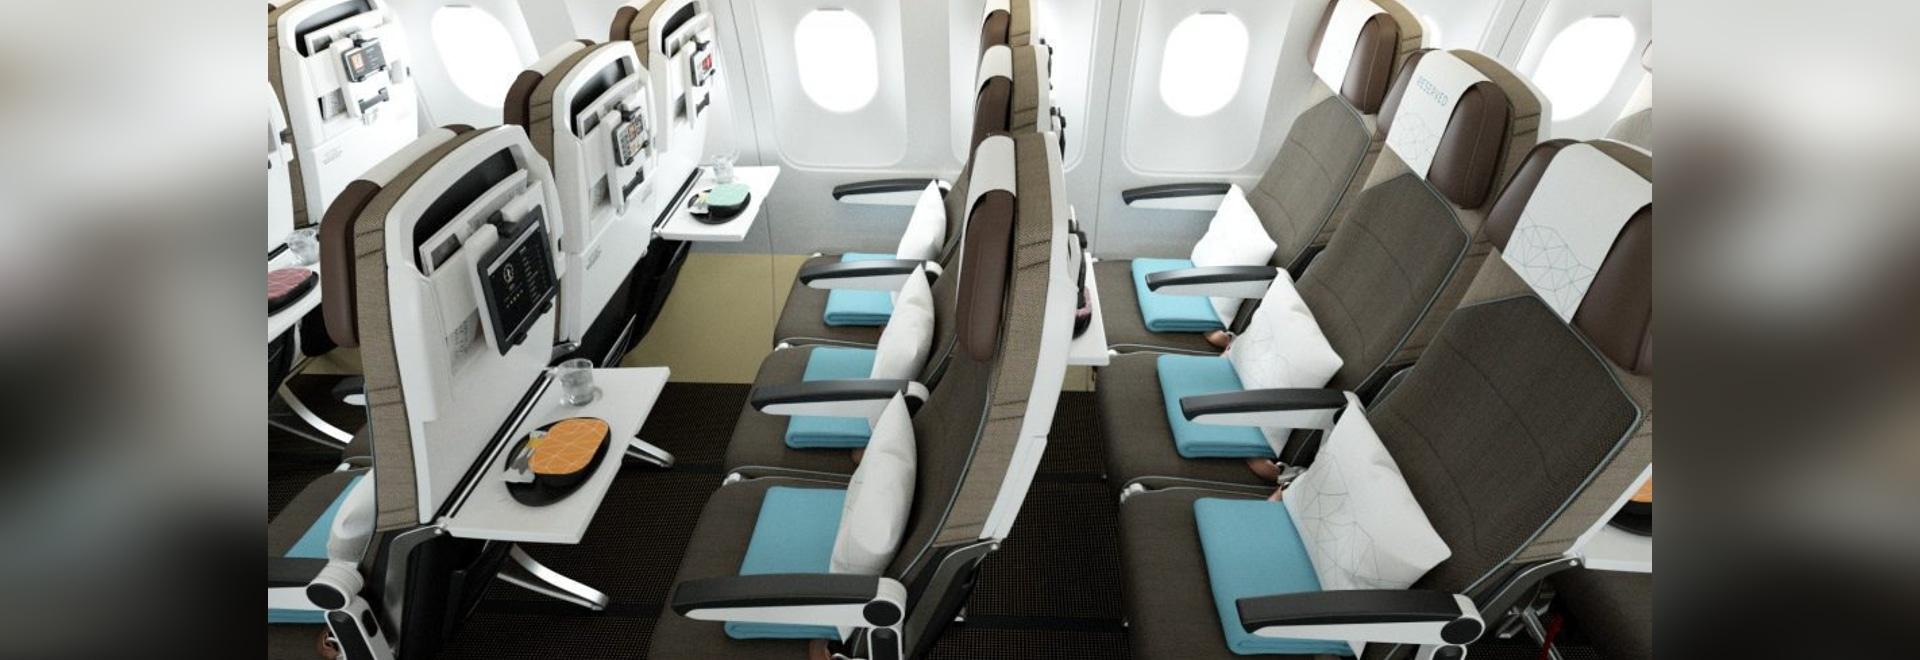 Etihad Ditches Seatback Screens in Economy Experience Overhaul (en anglais)